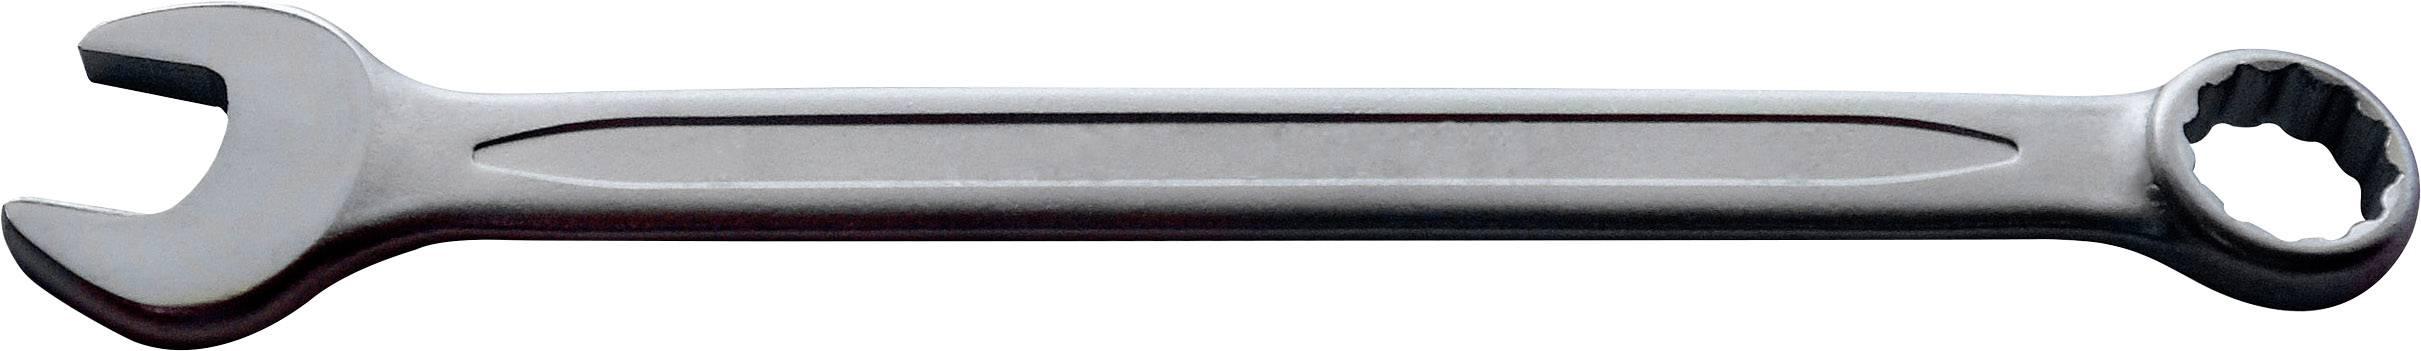 Očkoplochý klíč TOOLCRAFT 820839, N/A, 19 mm